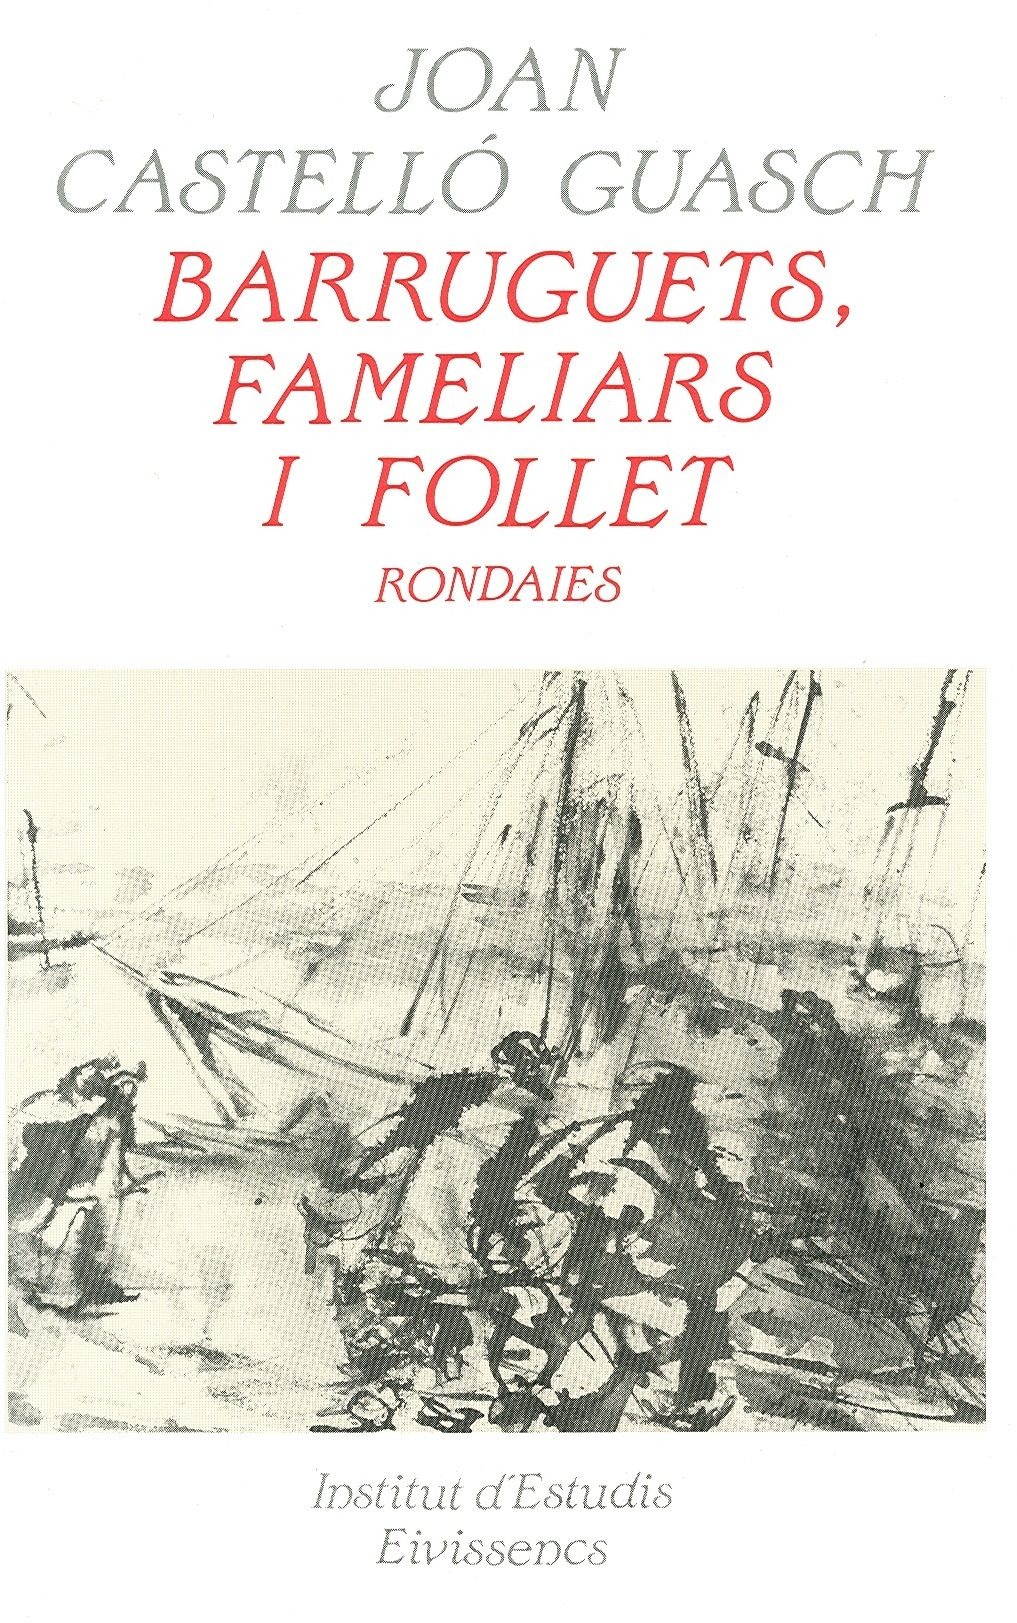 Barruguets, Fameliars i Follet. Rondaies.